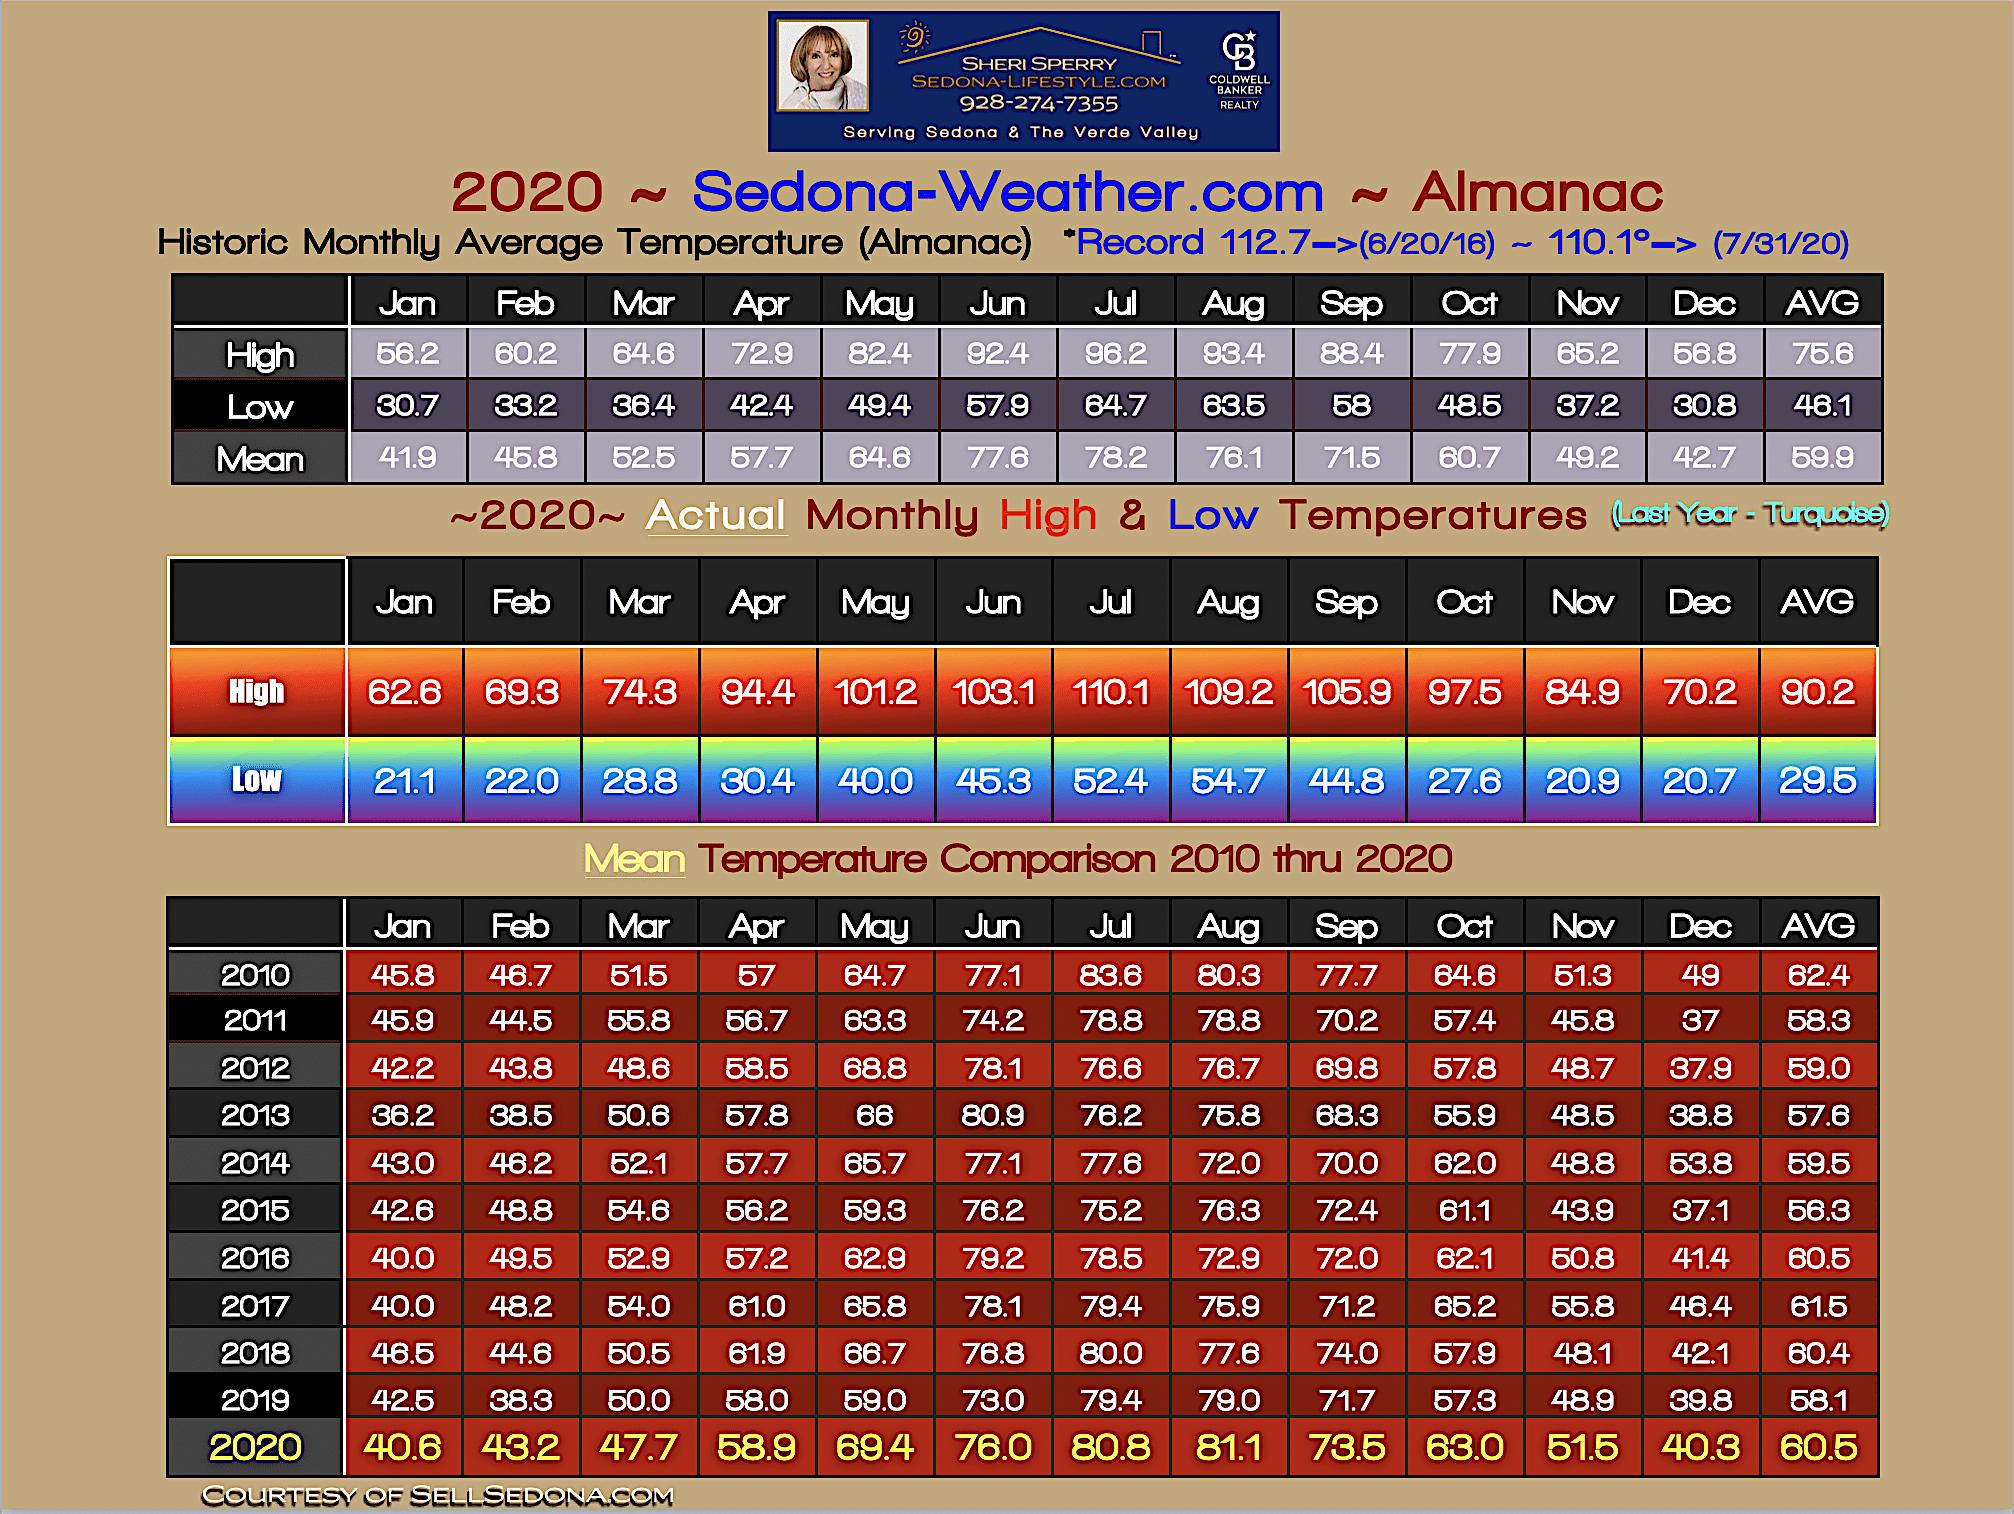 2020 Final Temperature Almanac for Sedona Arizona